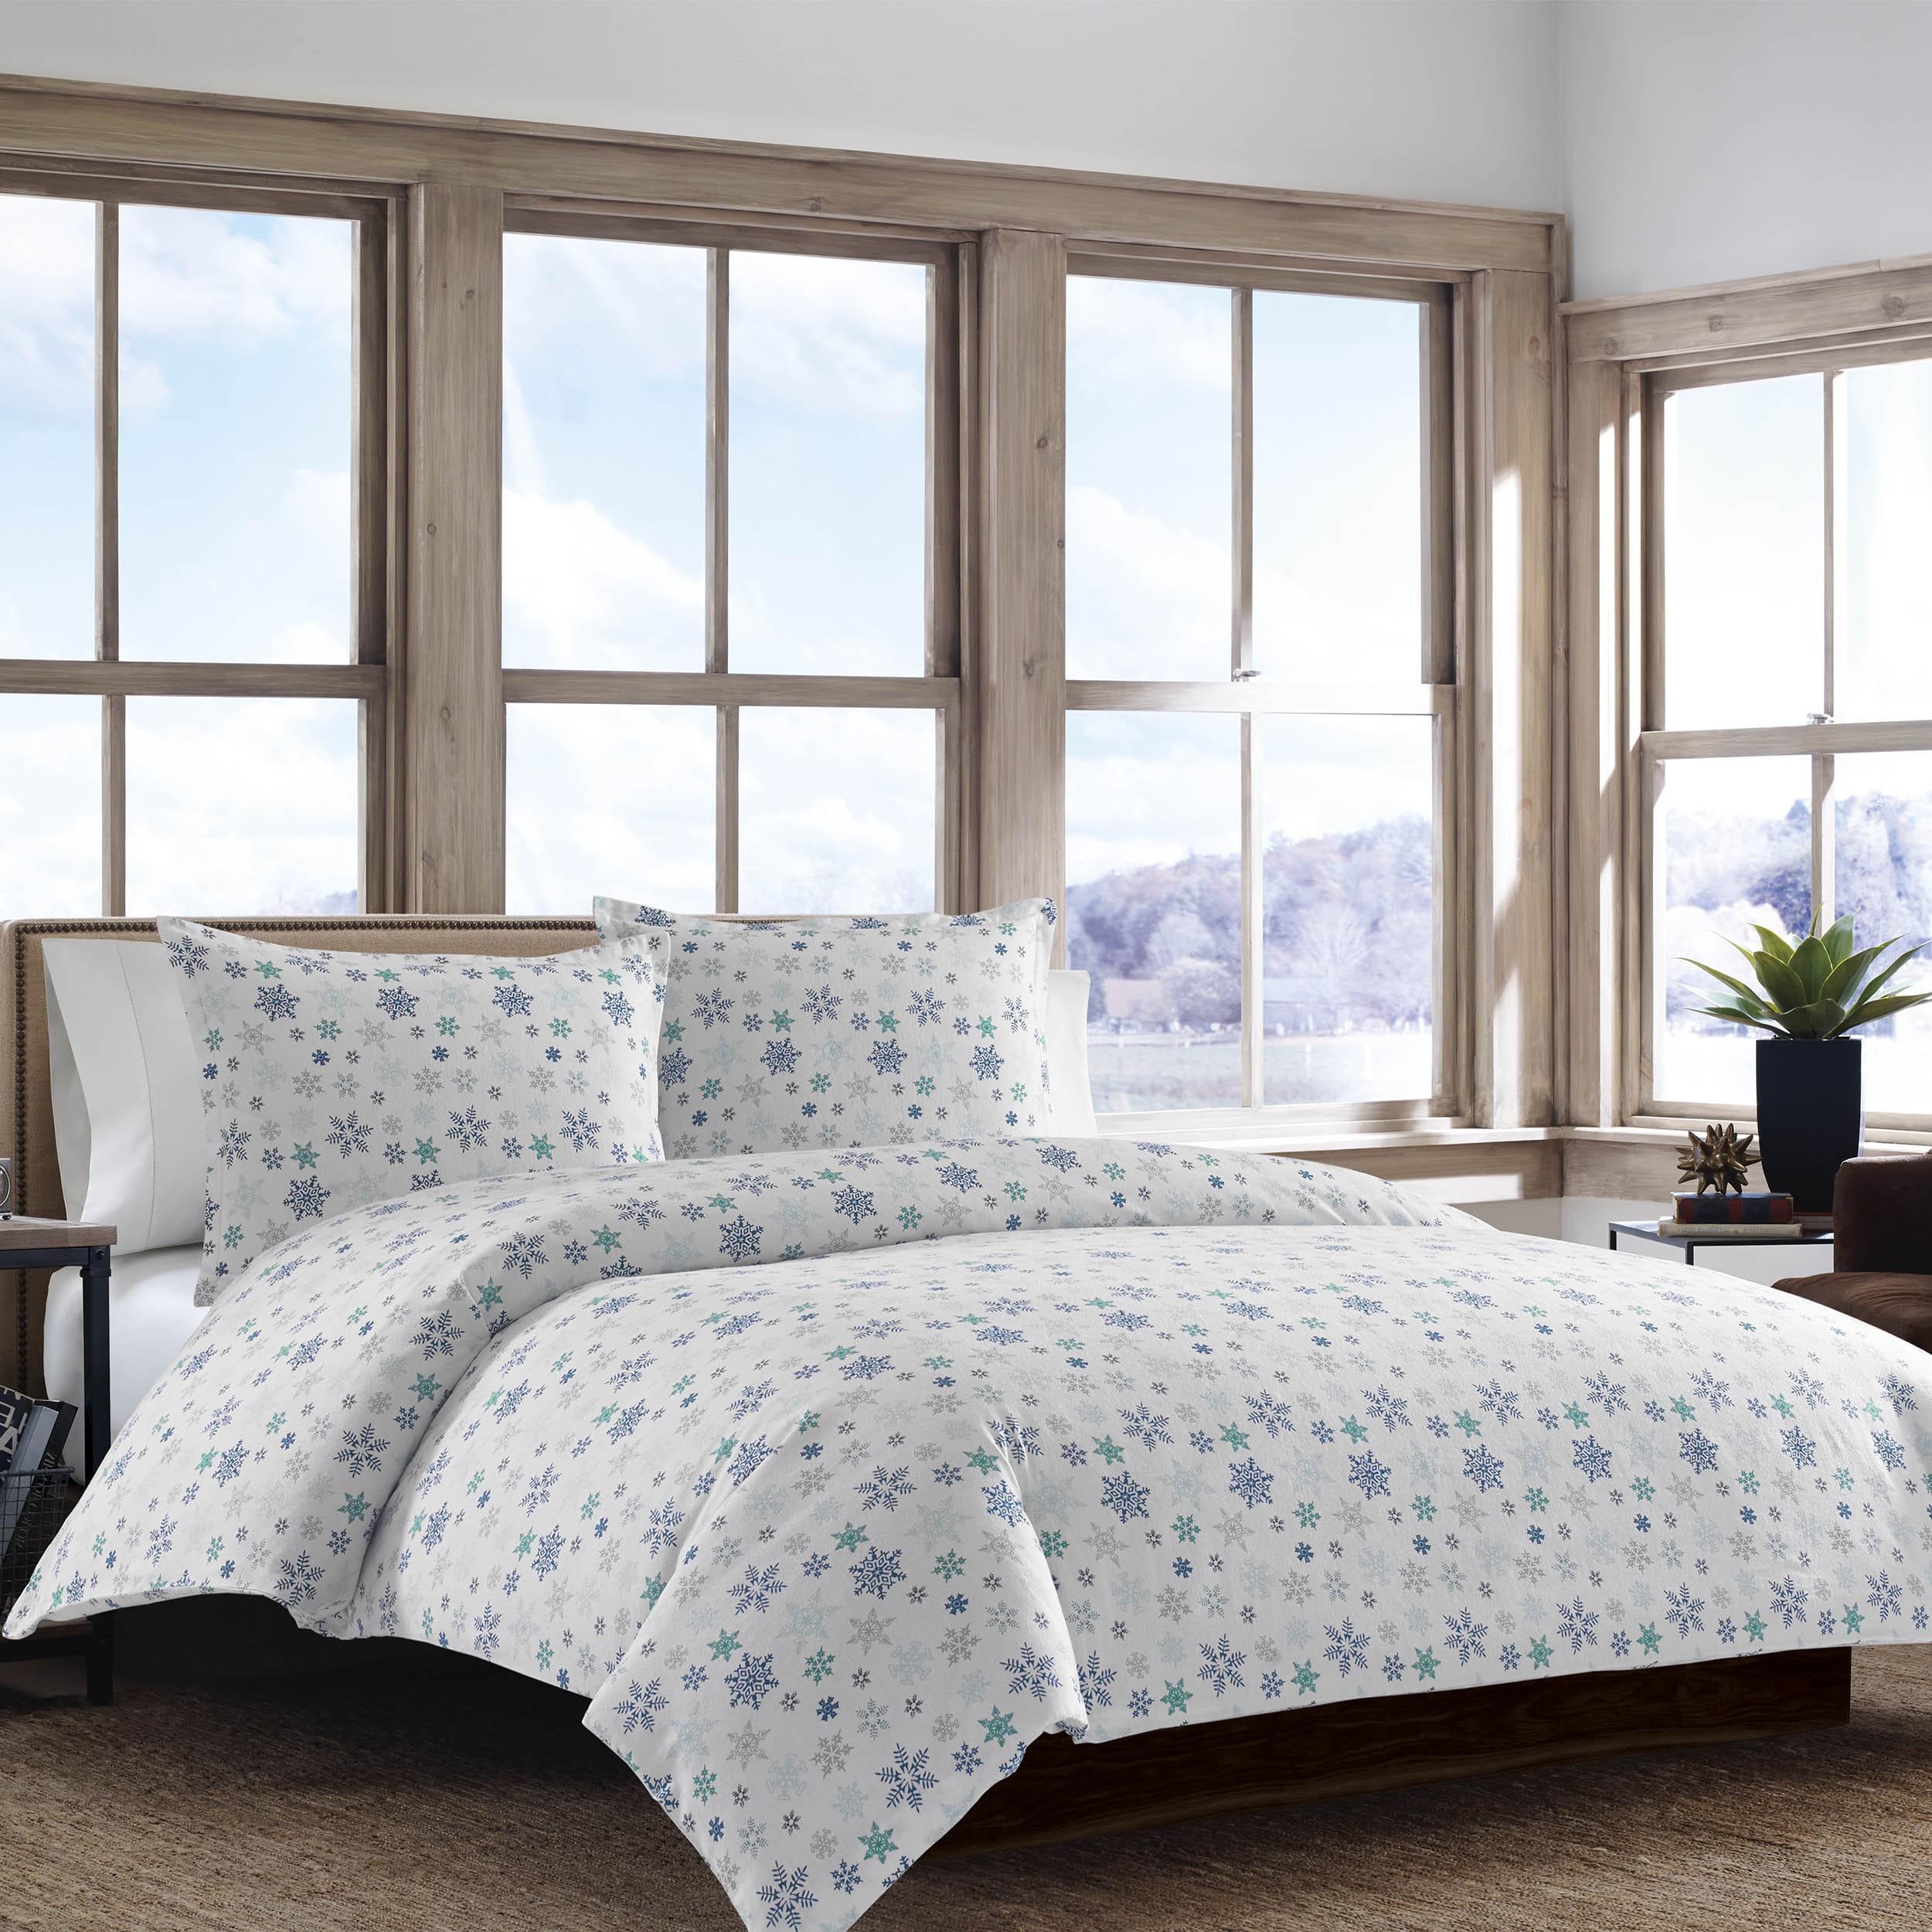 me bedding luxury duvet quilts sets camano cotton satin white king nnect cover gold eddie silk quilt set size co australia sale jacquard island blue bauer bed